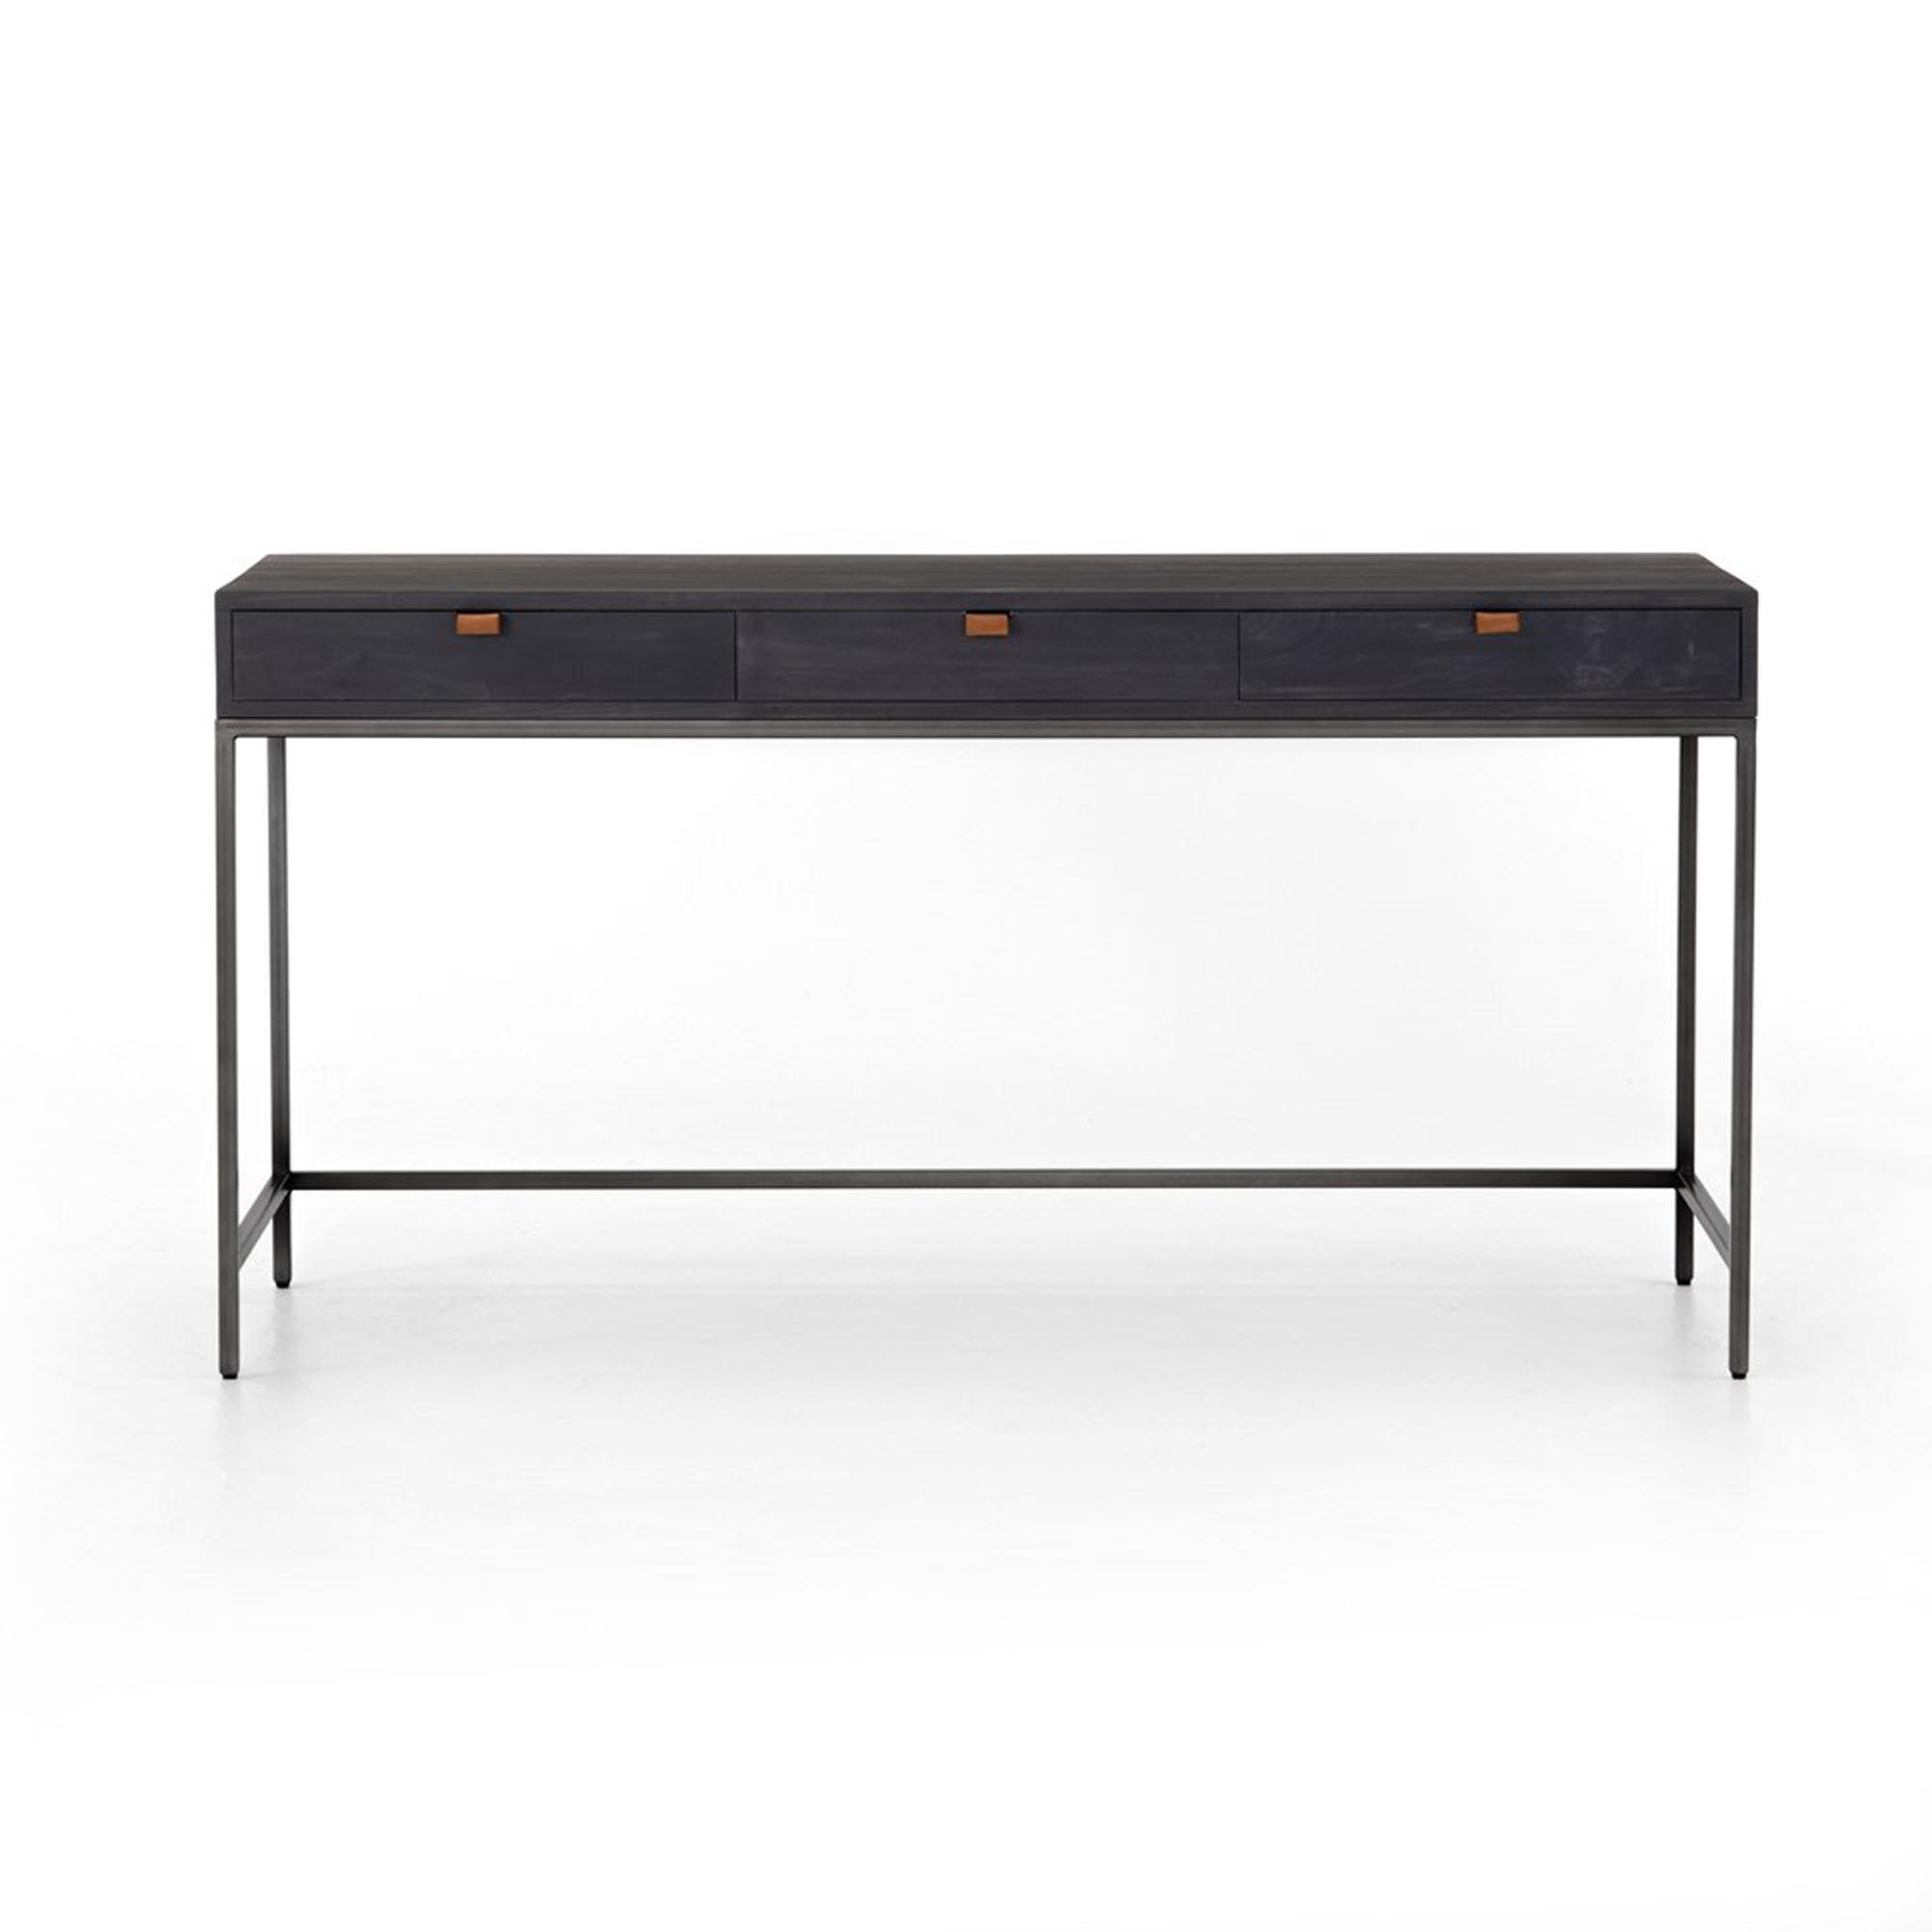 Theodore Industrial Loft Black Wood Iron 3 Drawer Desk